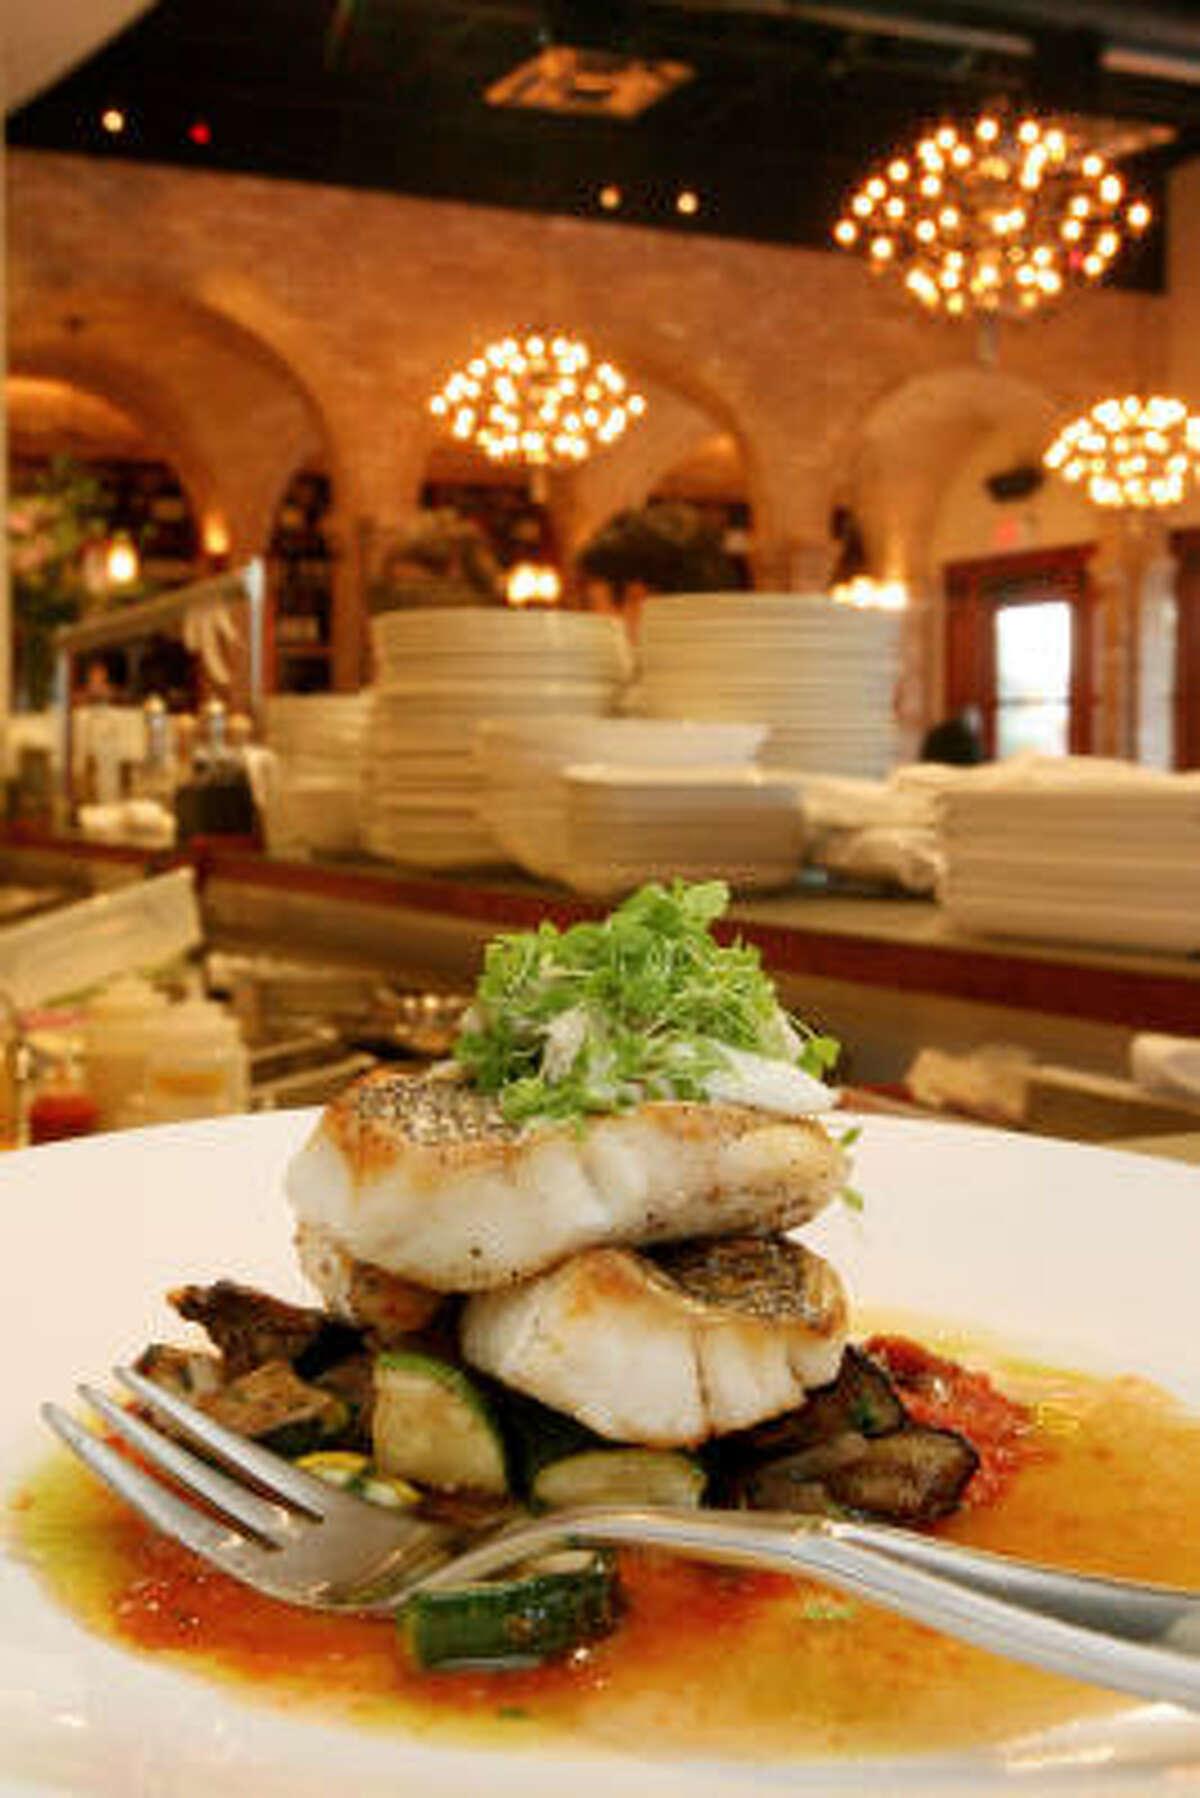 The chef here serves modern Texas Gulf Coast fare seen through a Spanish-tinted lens.